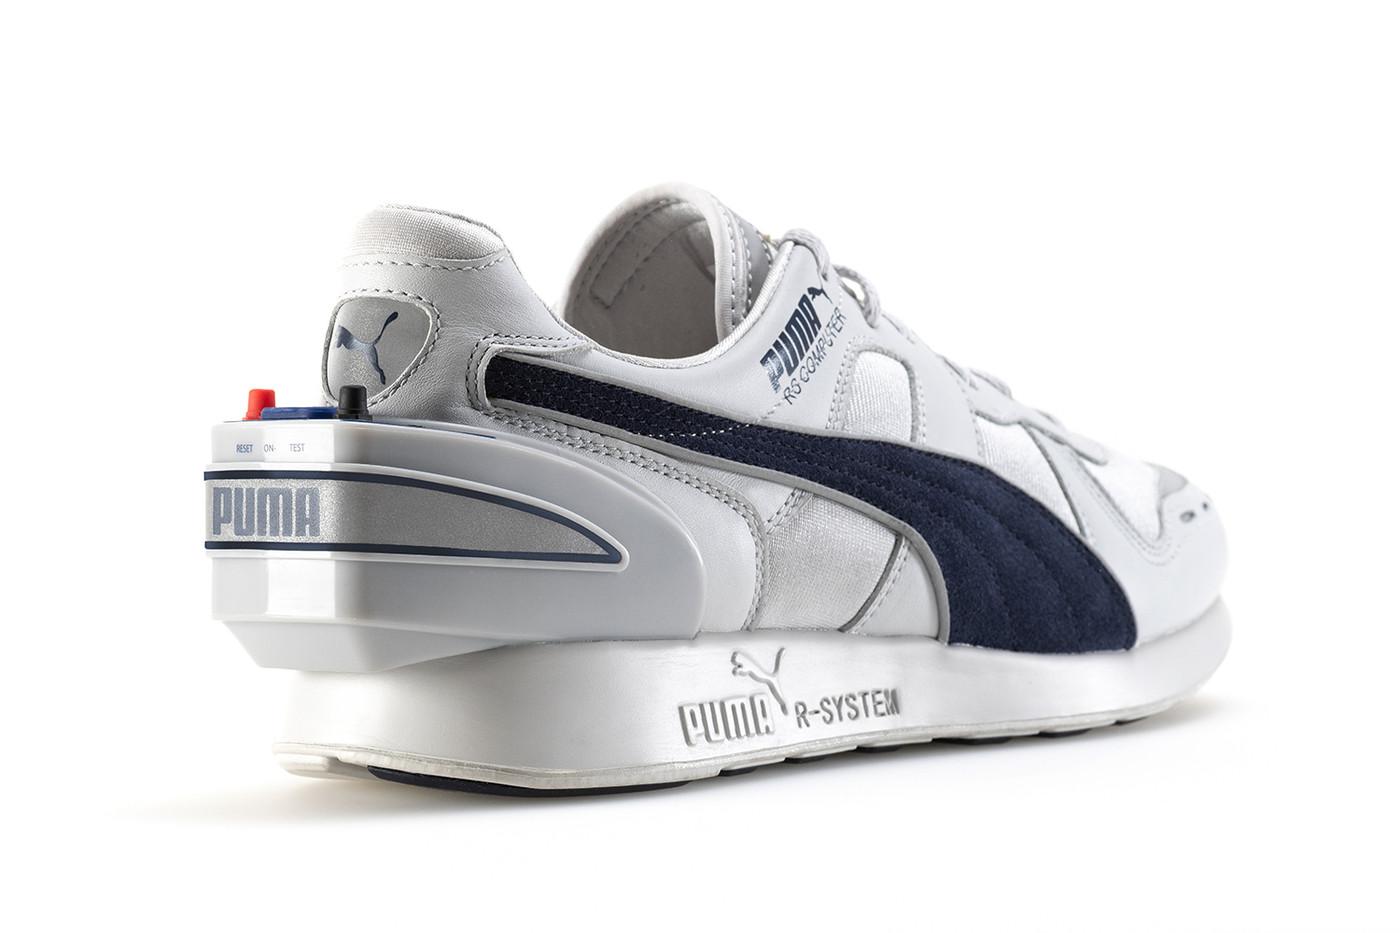 https: img-o.okeinfo.net content 2018 12 15 57 1991670 canggih-sepatu-ini-miliki-teknologi-smartwatch-aCEEaCr2hl.jpg